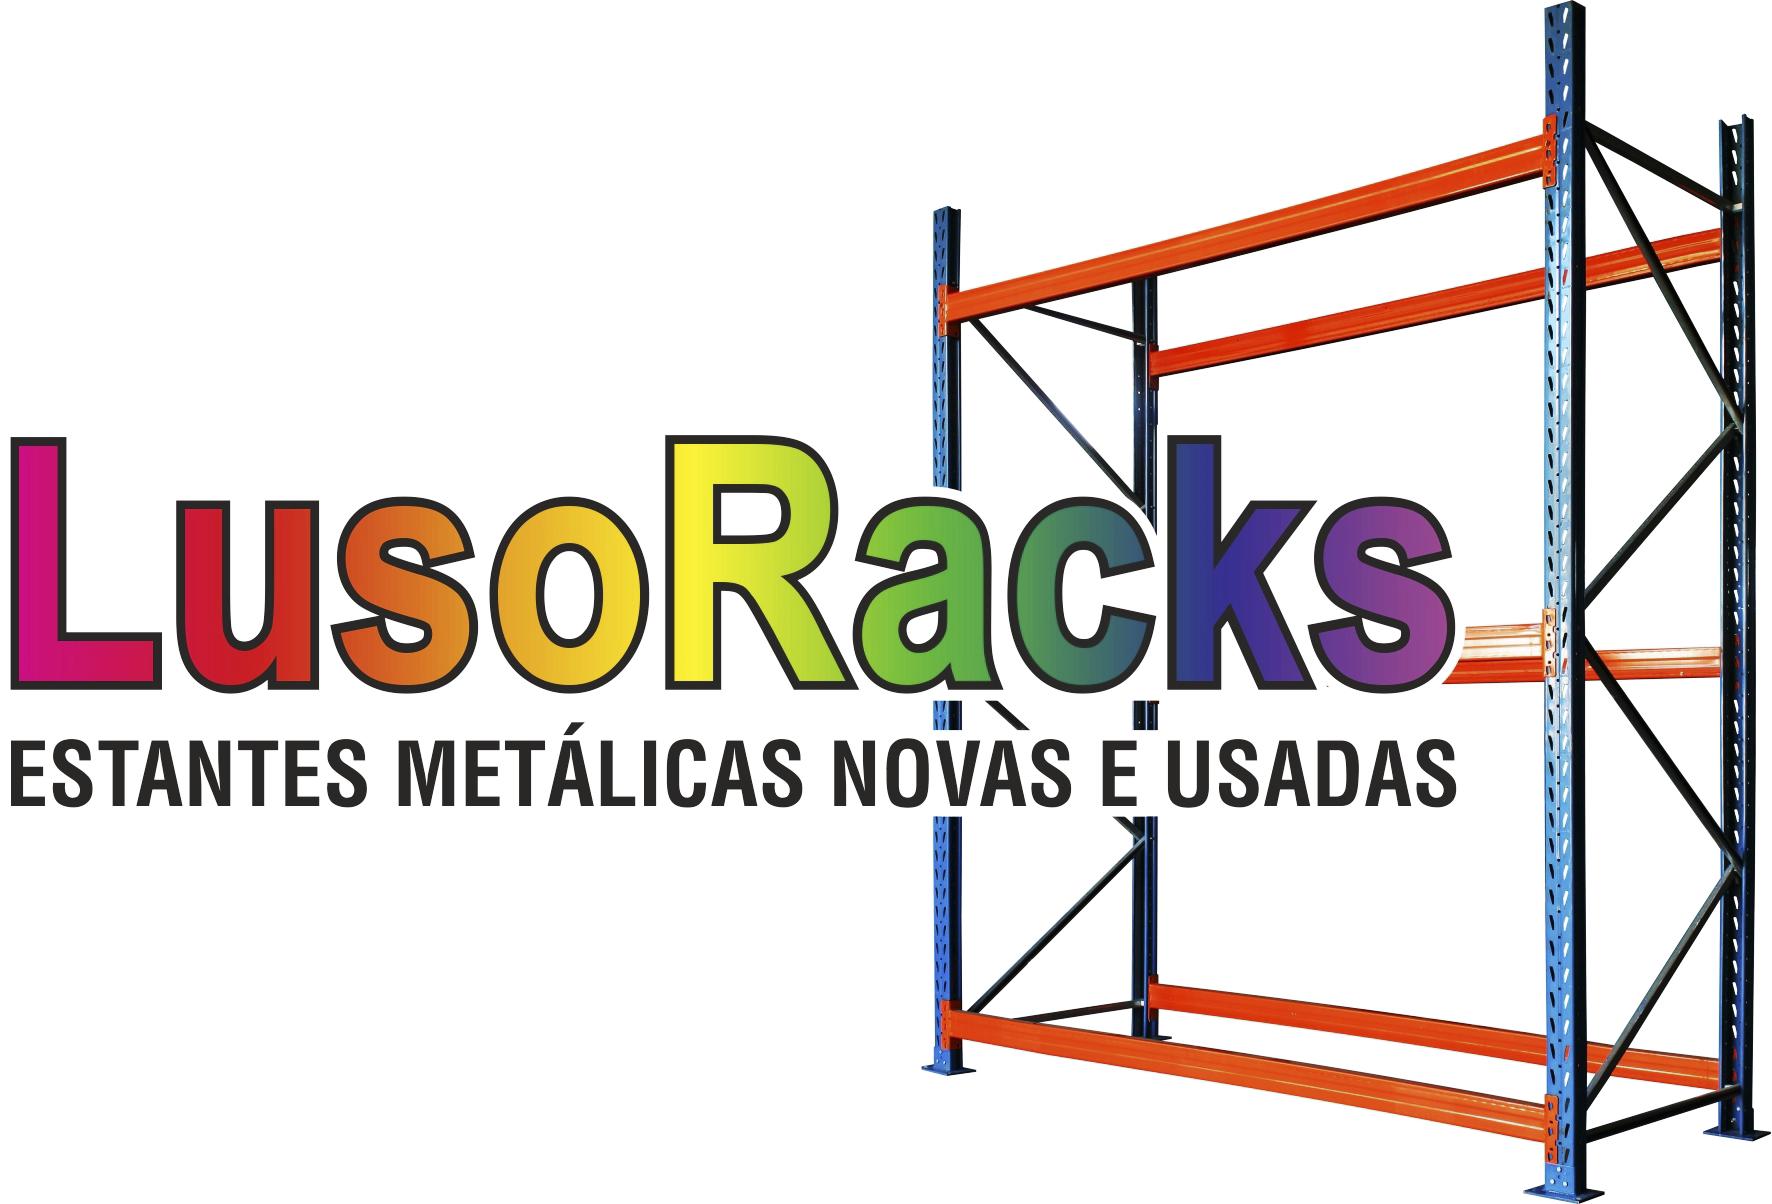 Luso Racks Transp.png